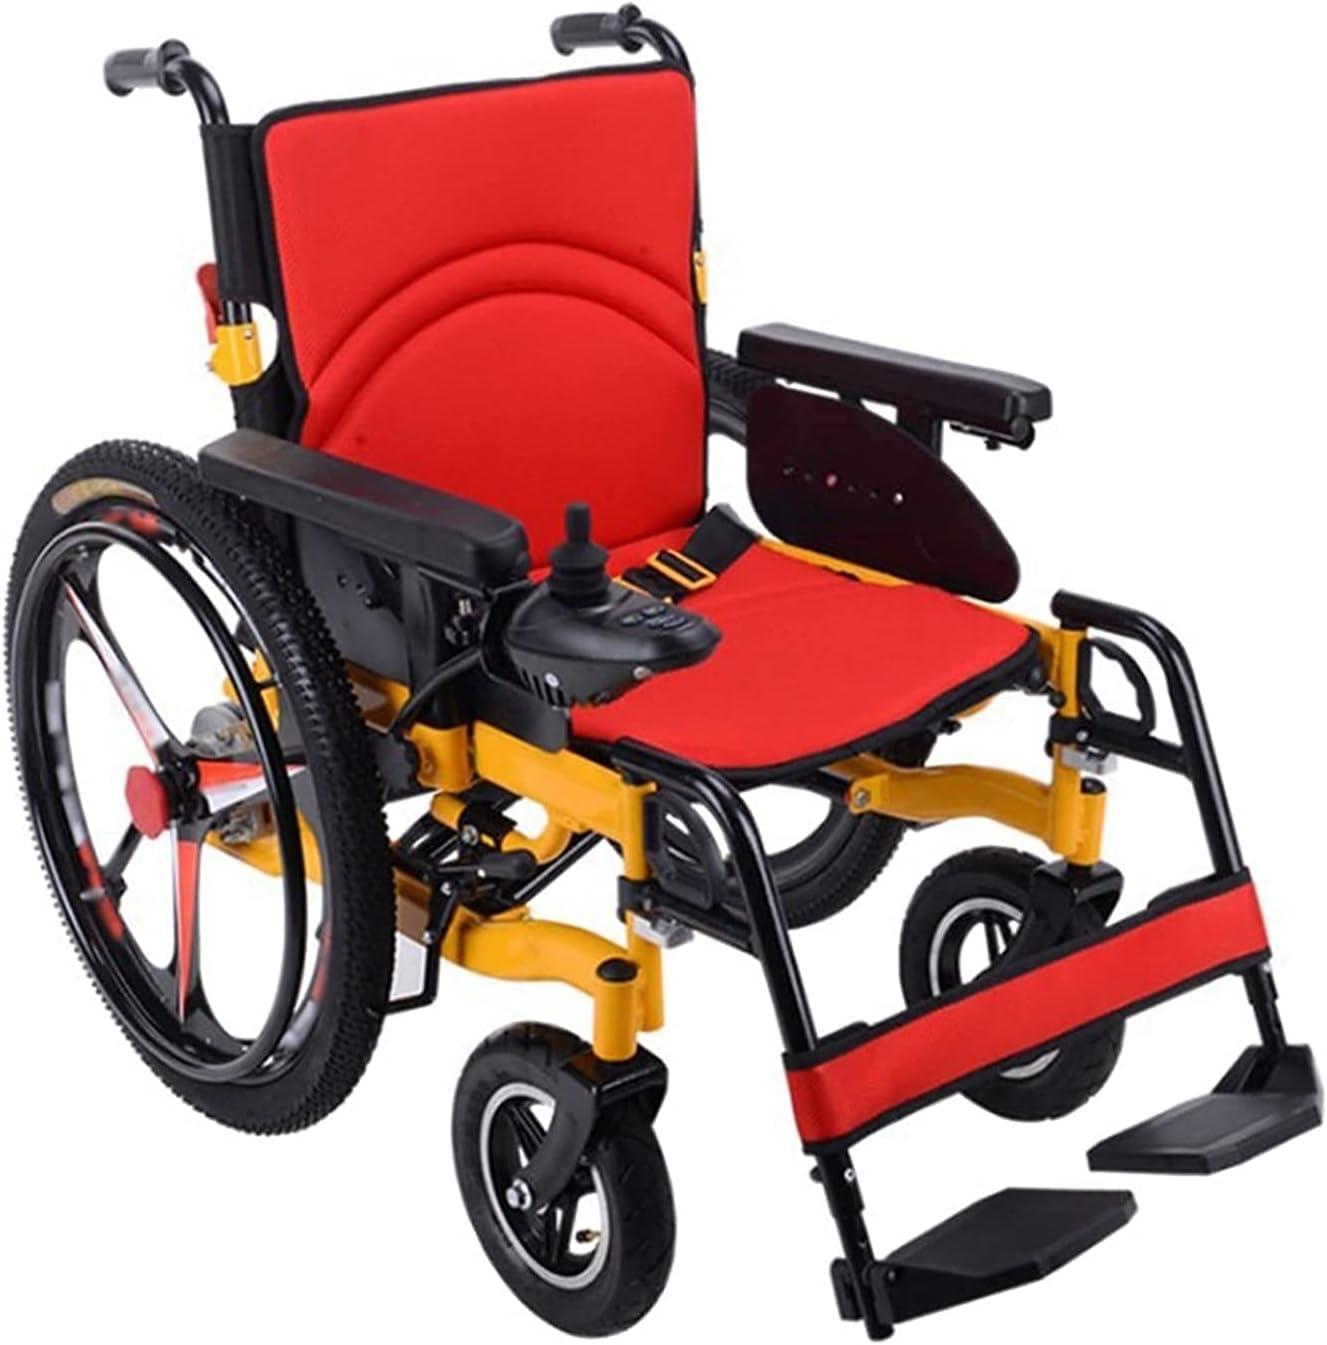 Japan Maker New Electric Wheelchair Intelligent Sales Automatic Folding Lightweight Al